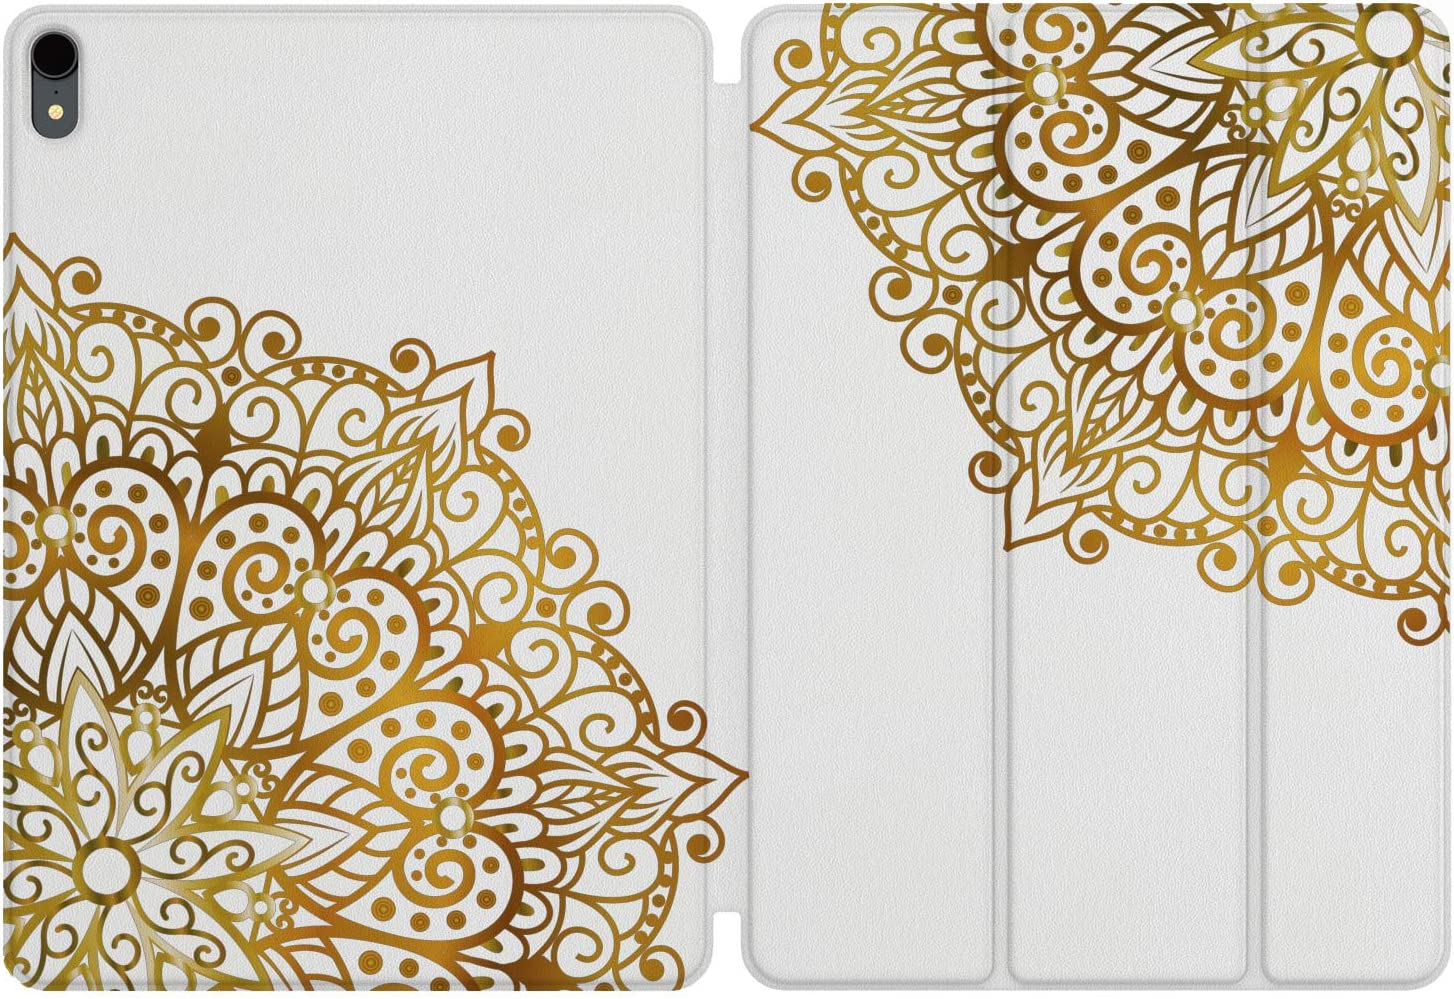 Lex Altern iPad Case Pro 11 inch 12.9 Magnetic Cover 2019 2018 3D Generation Apple Protective Hard Shell Folio Trifold Smart Auto Wake Sleep Pencil Boho Gentle Mandala Black Pattern Girl Print Stand